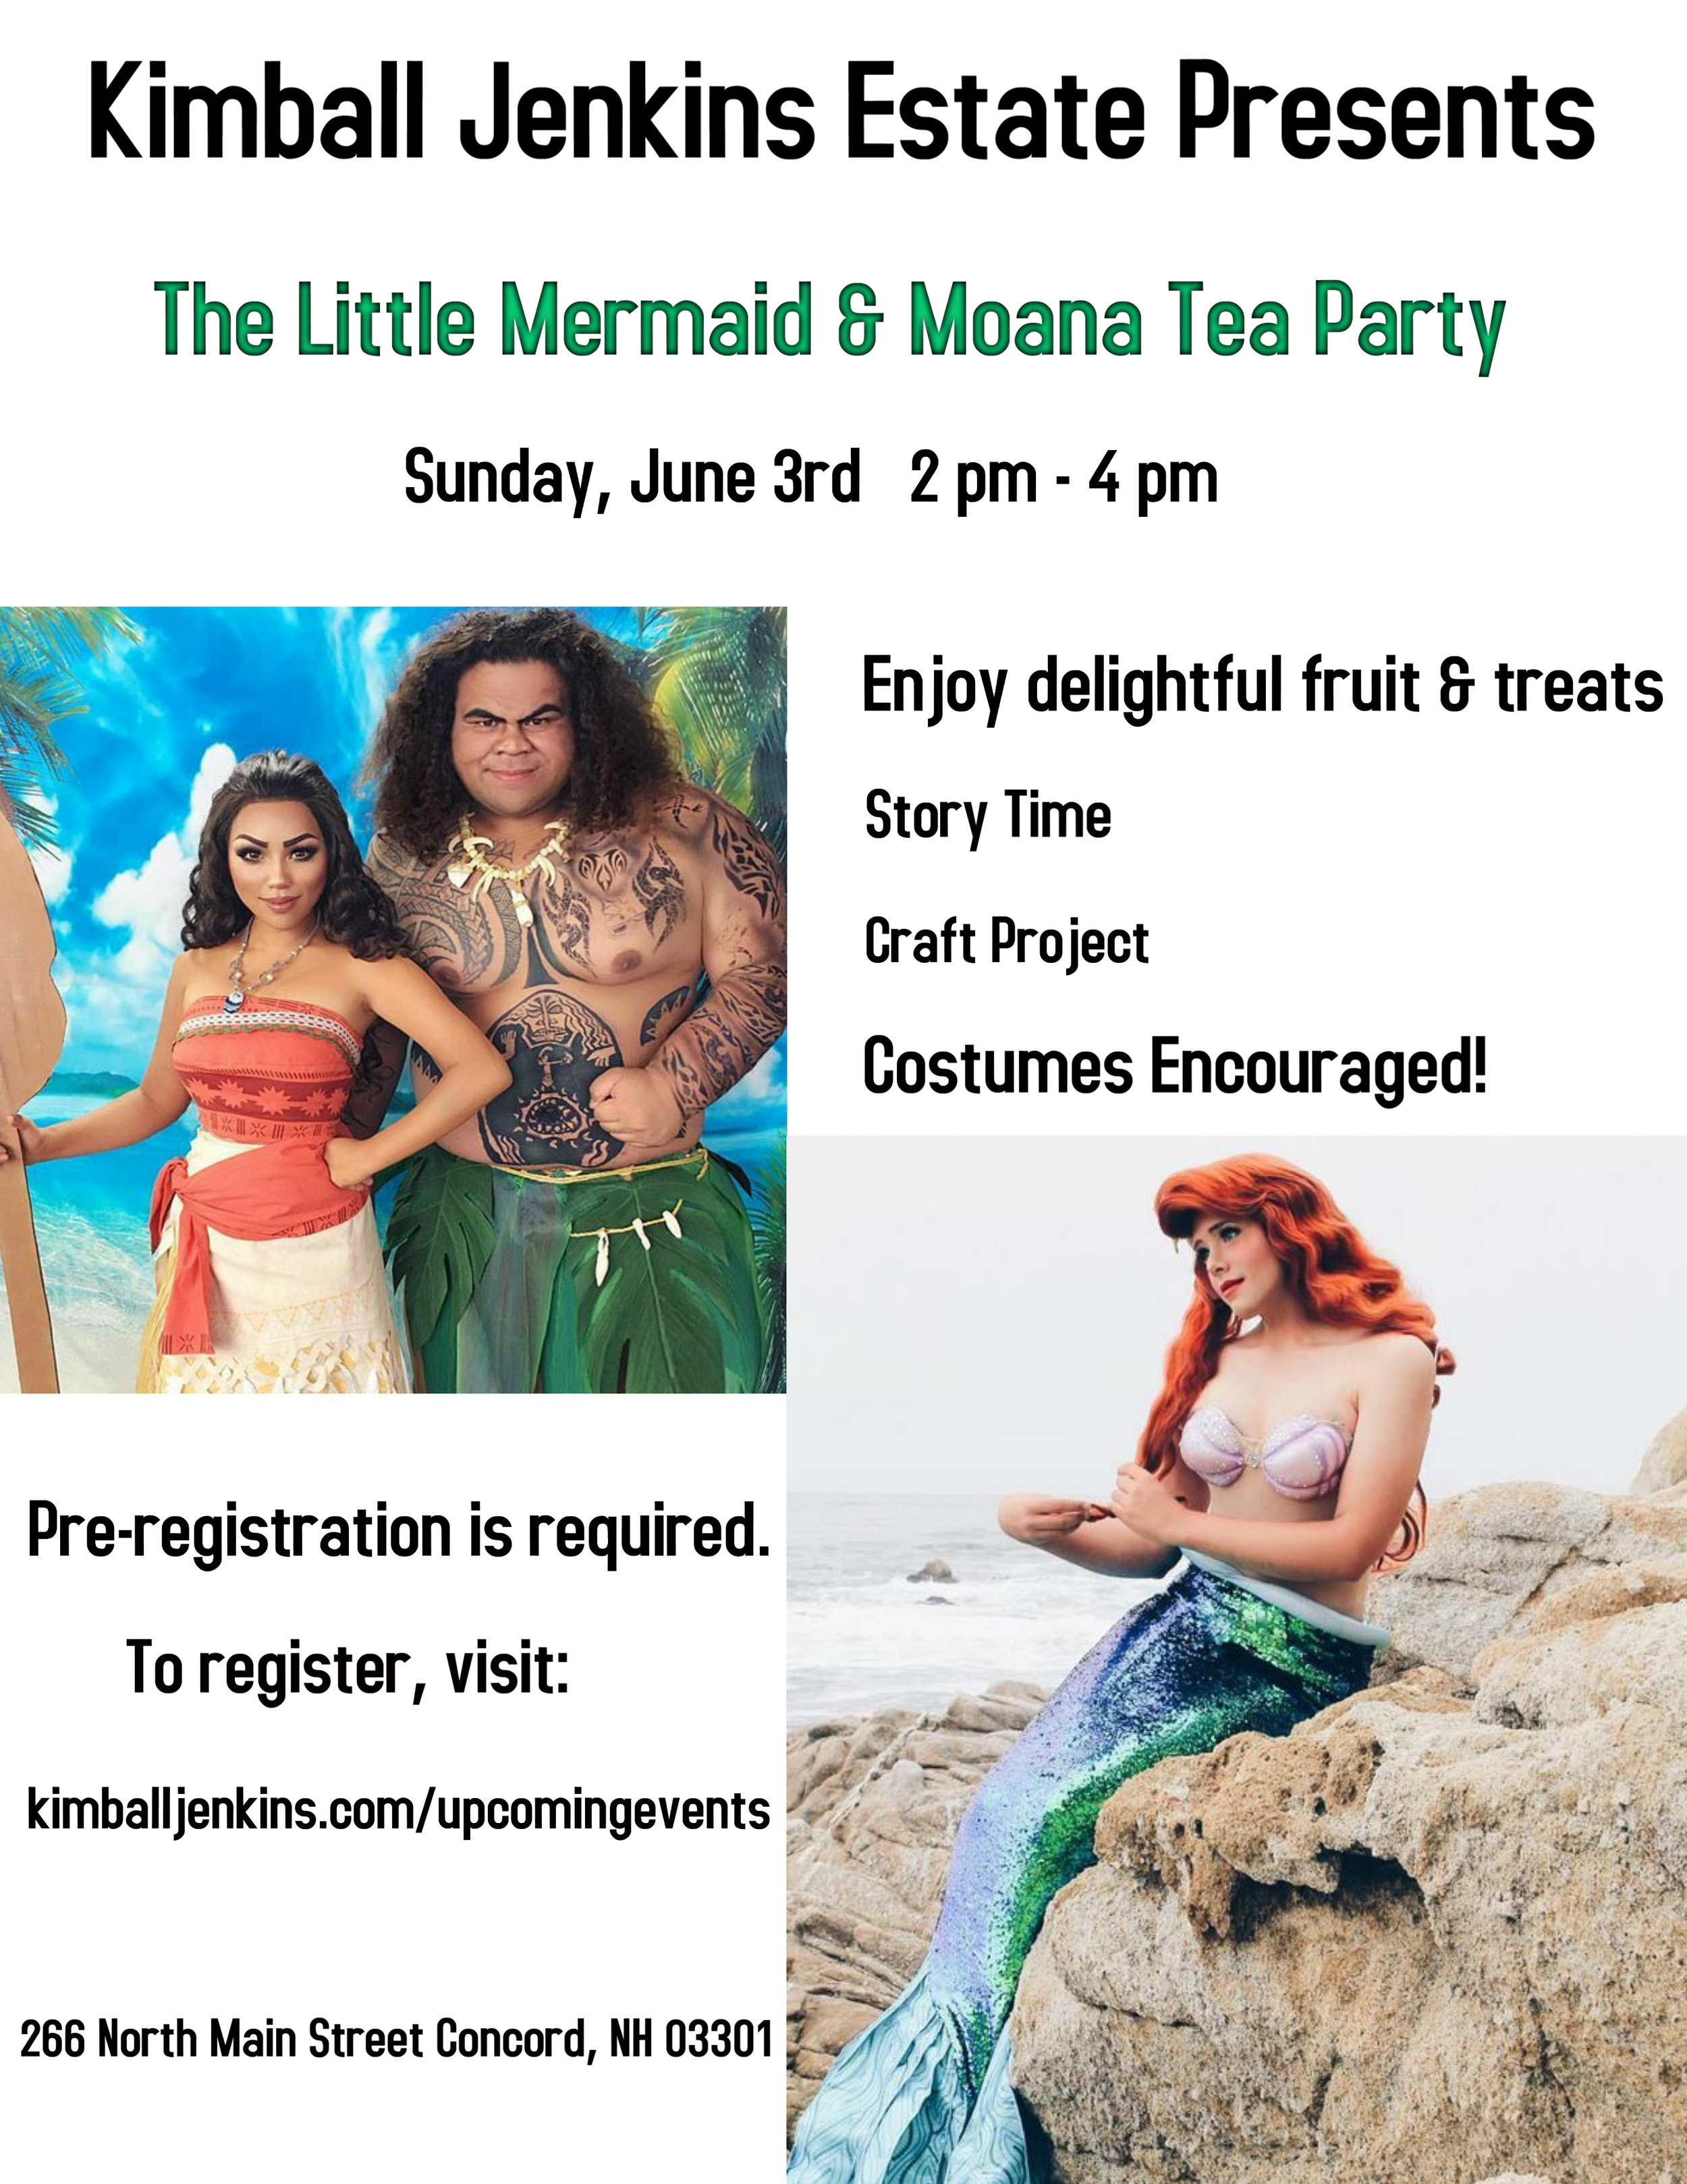 little mermaid & moana.jpg